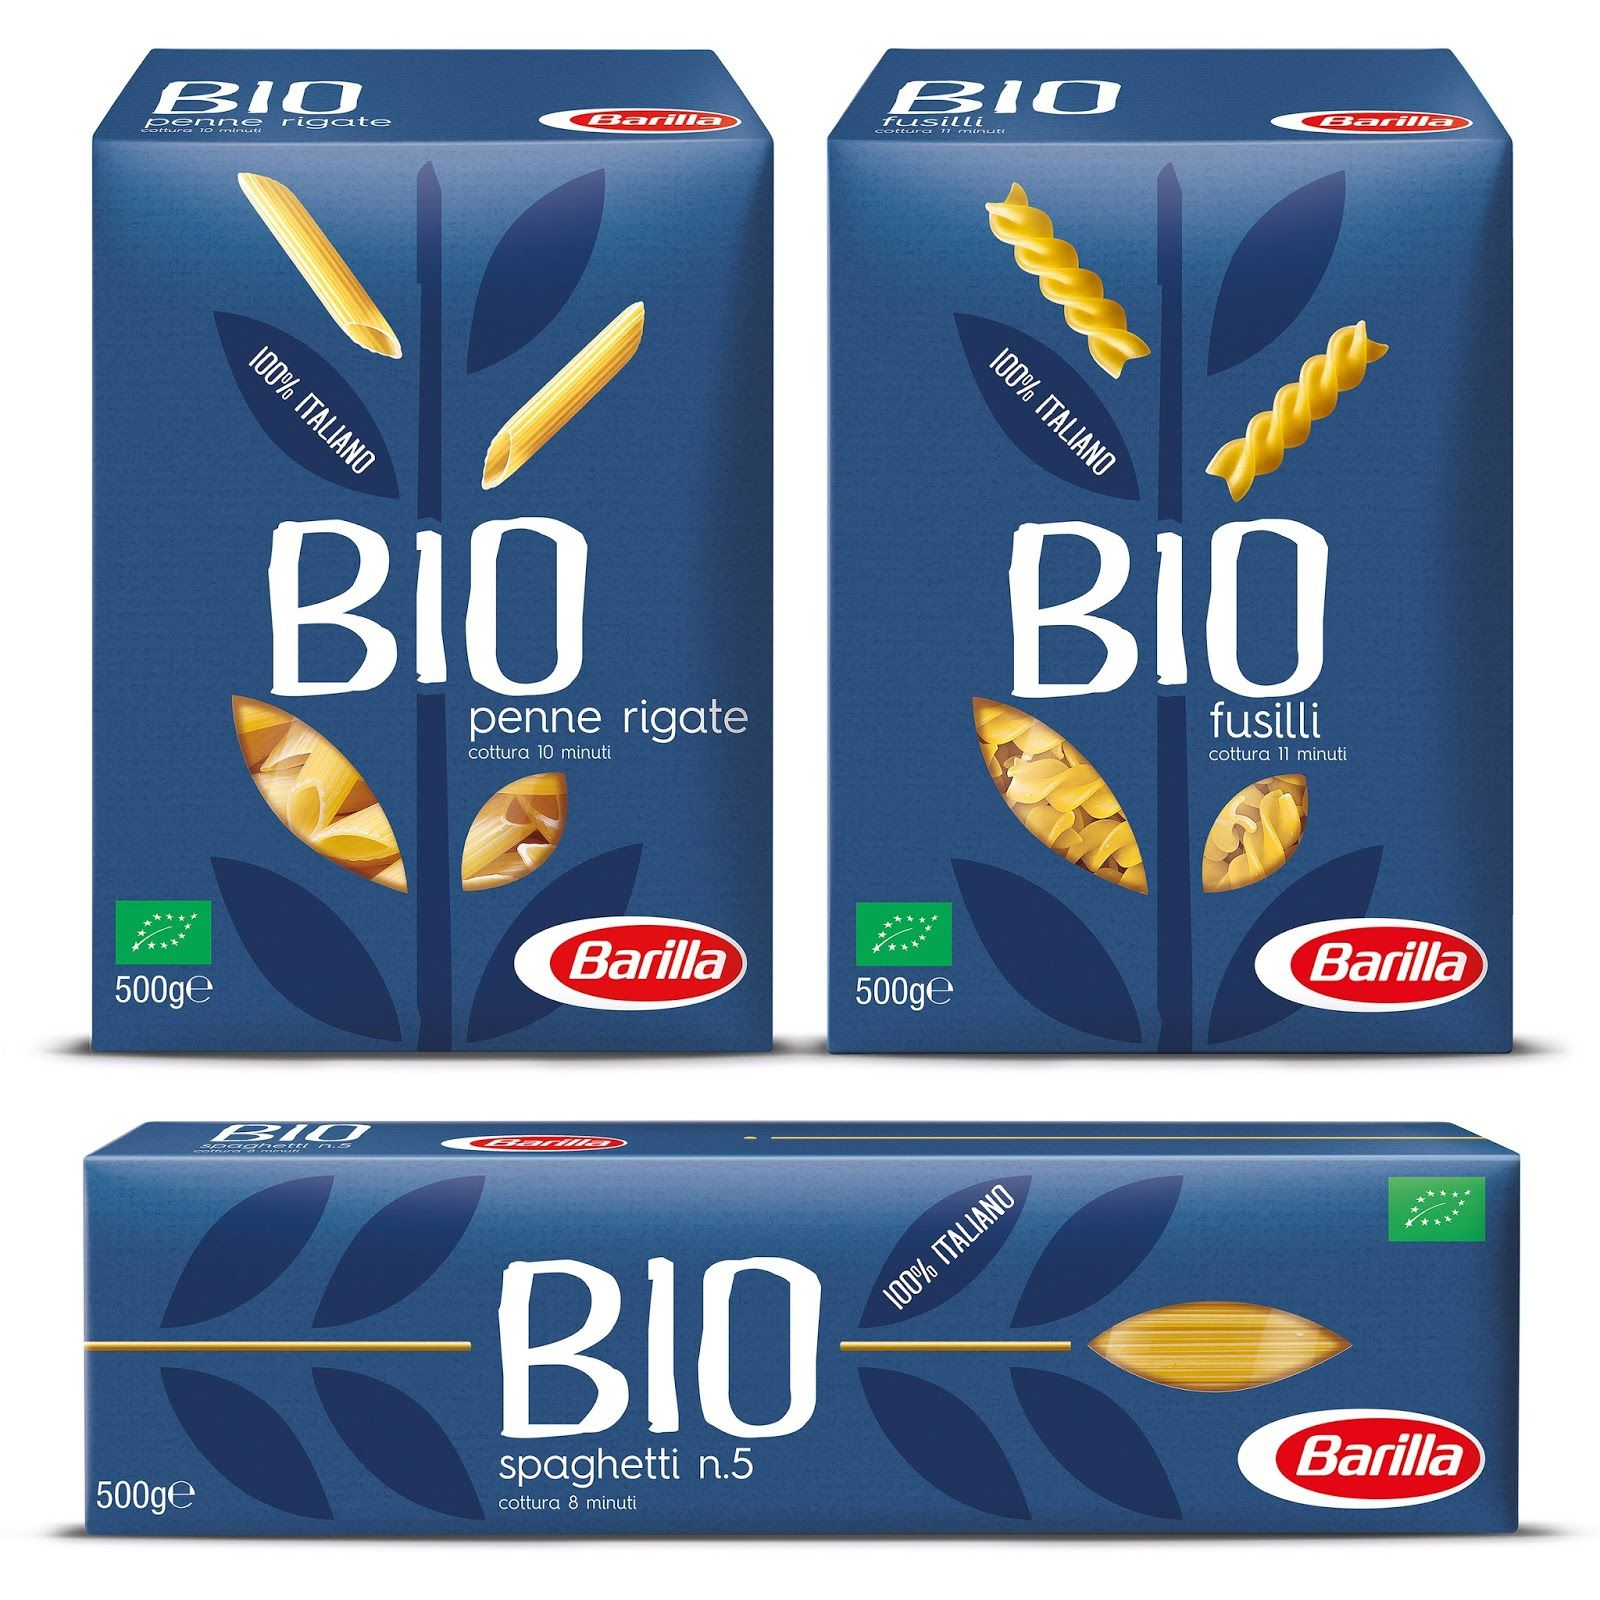 Barilla (gamme de pâtes bio) I Design : FutureBrand, Italie (février 2018)